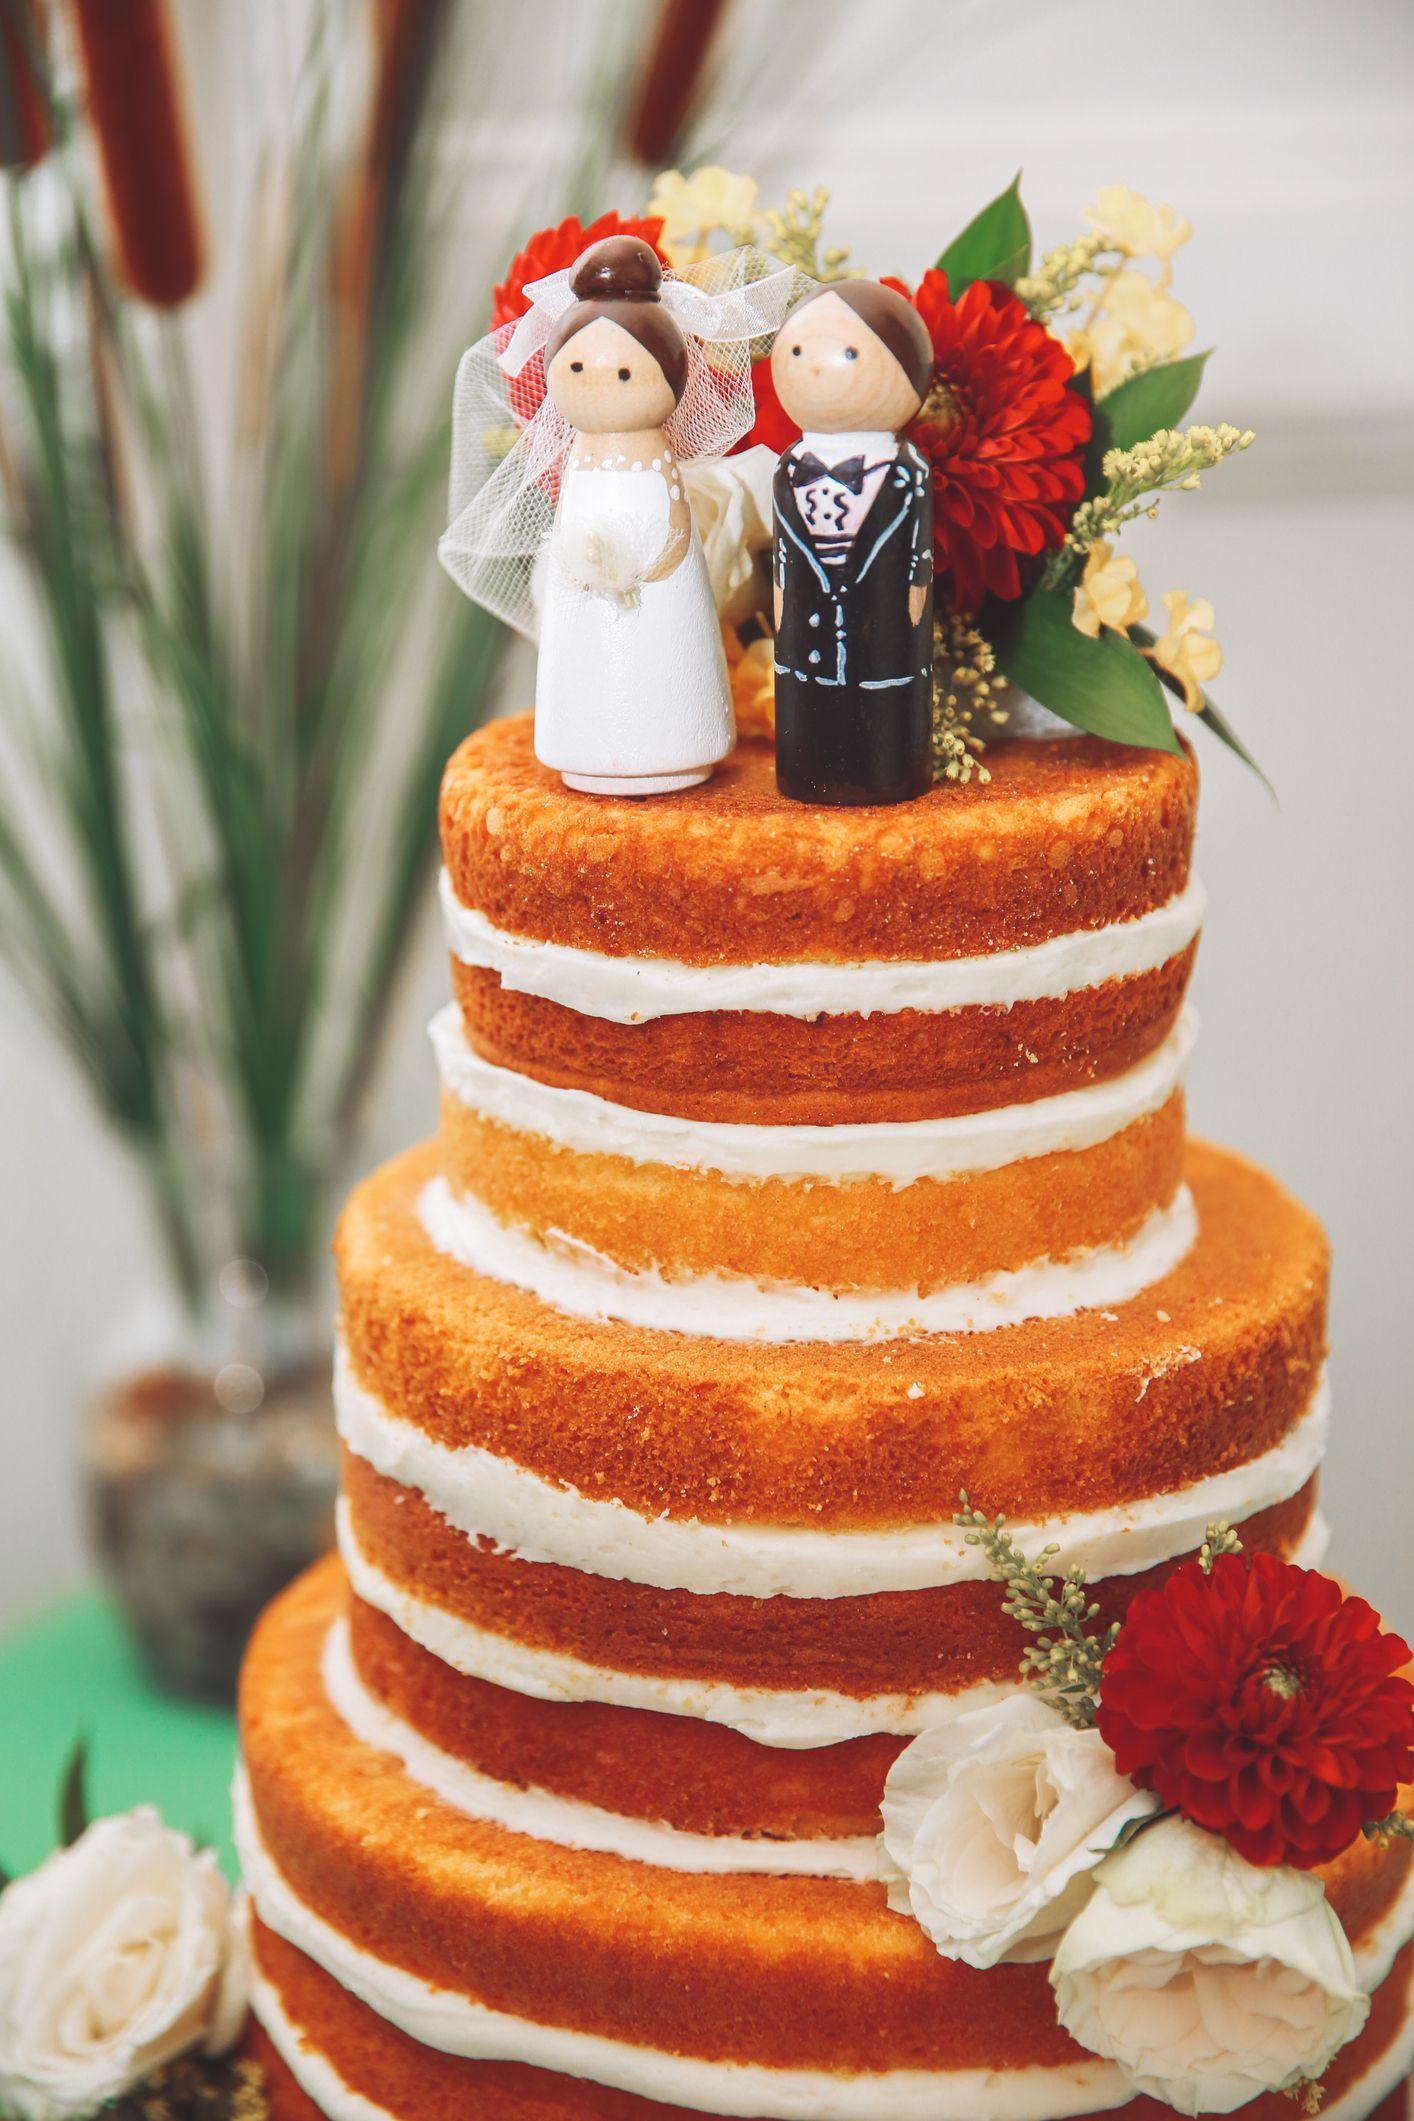 10 Real DIY Wedding Cakes Inspiring Tales Of Amateurs Making